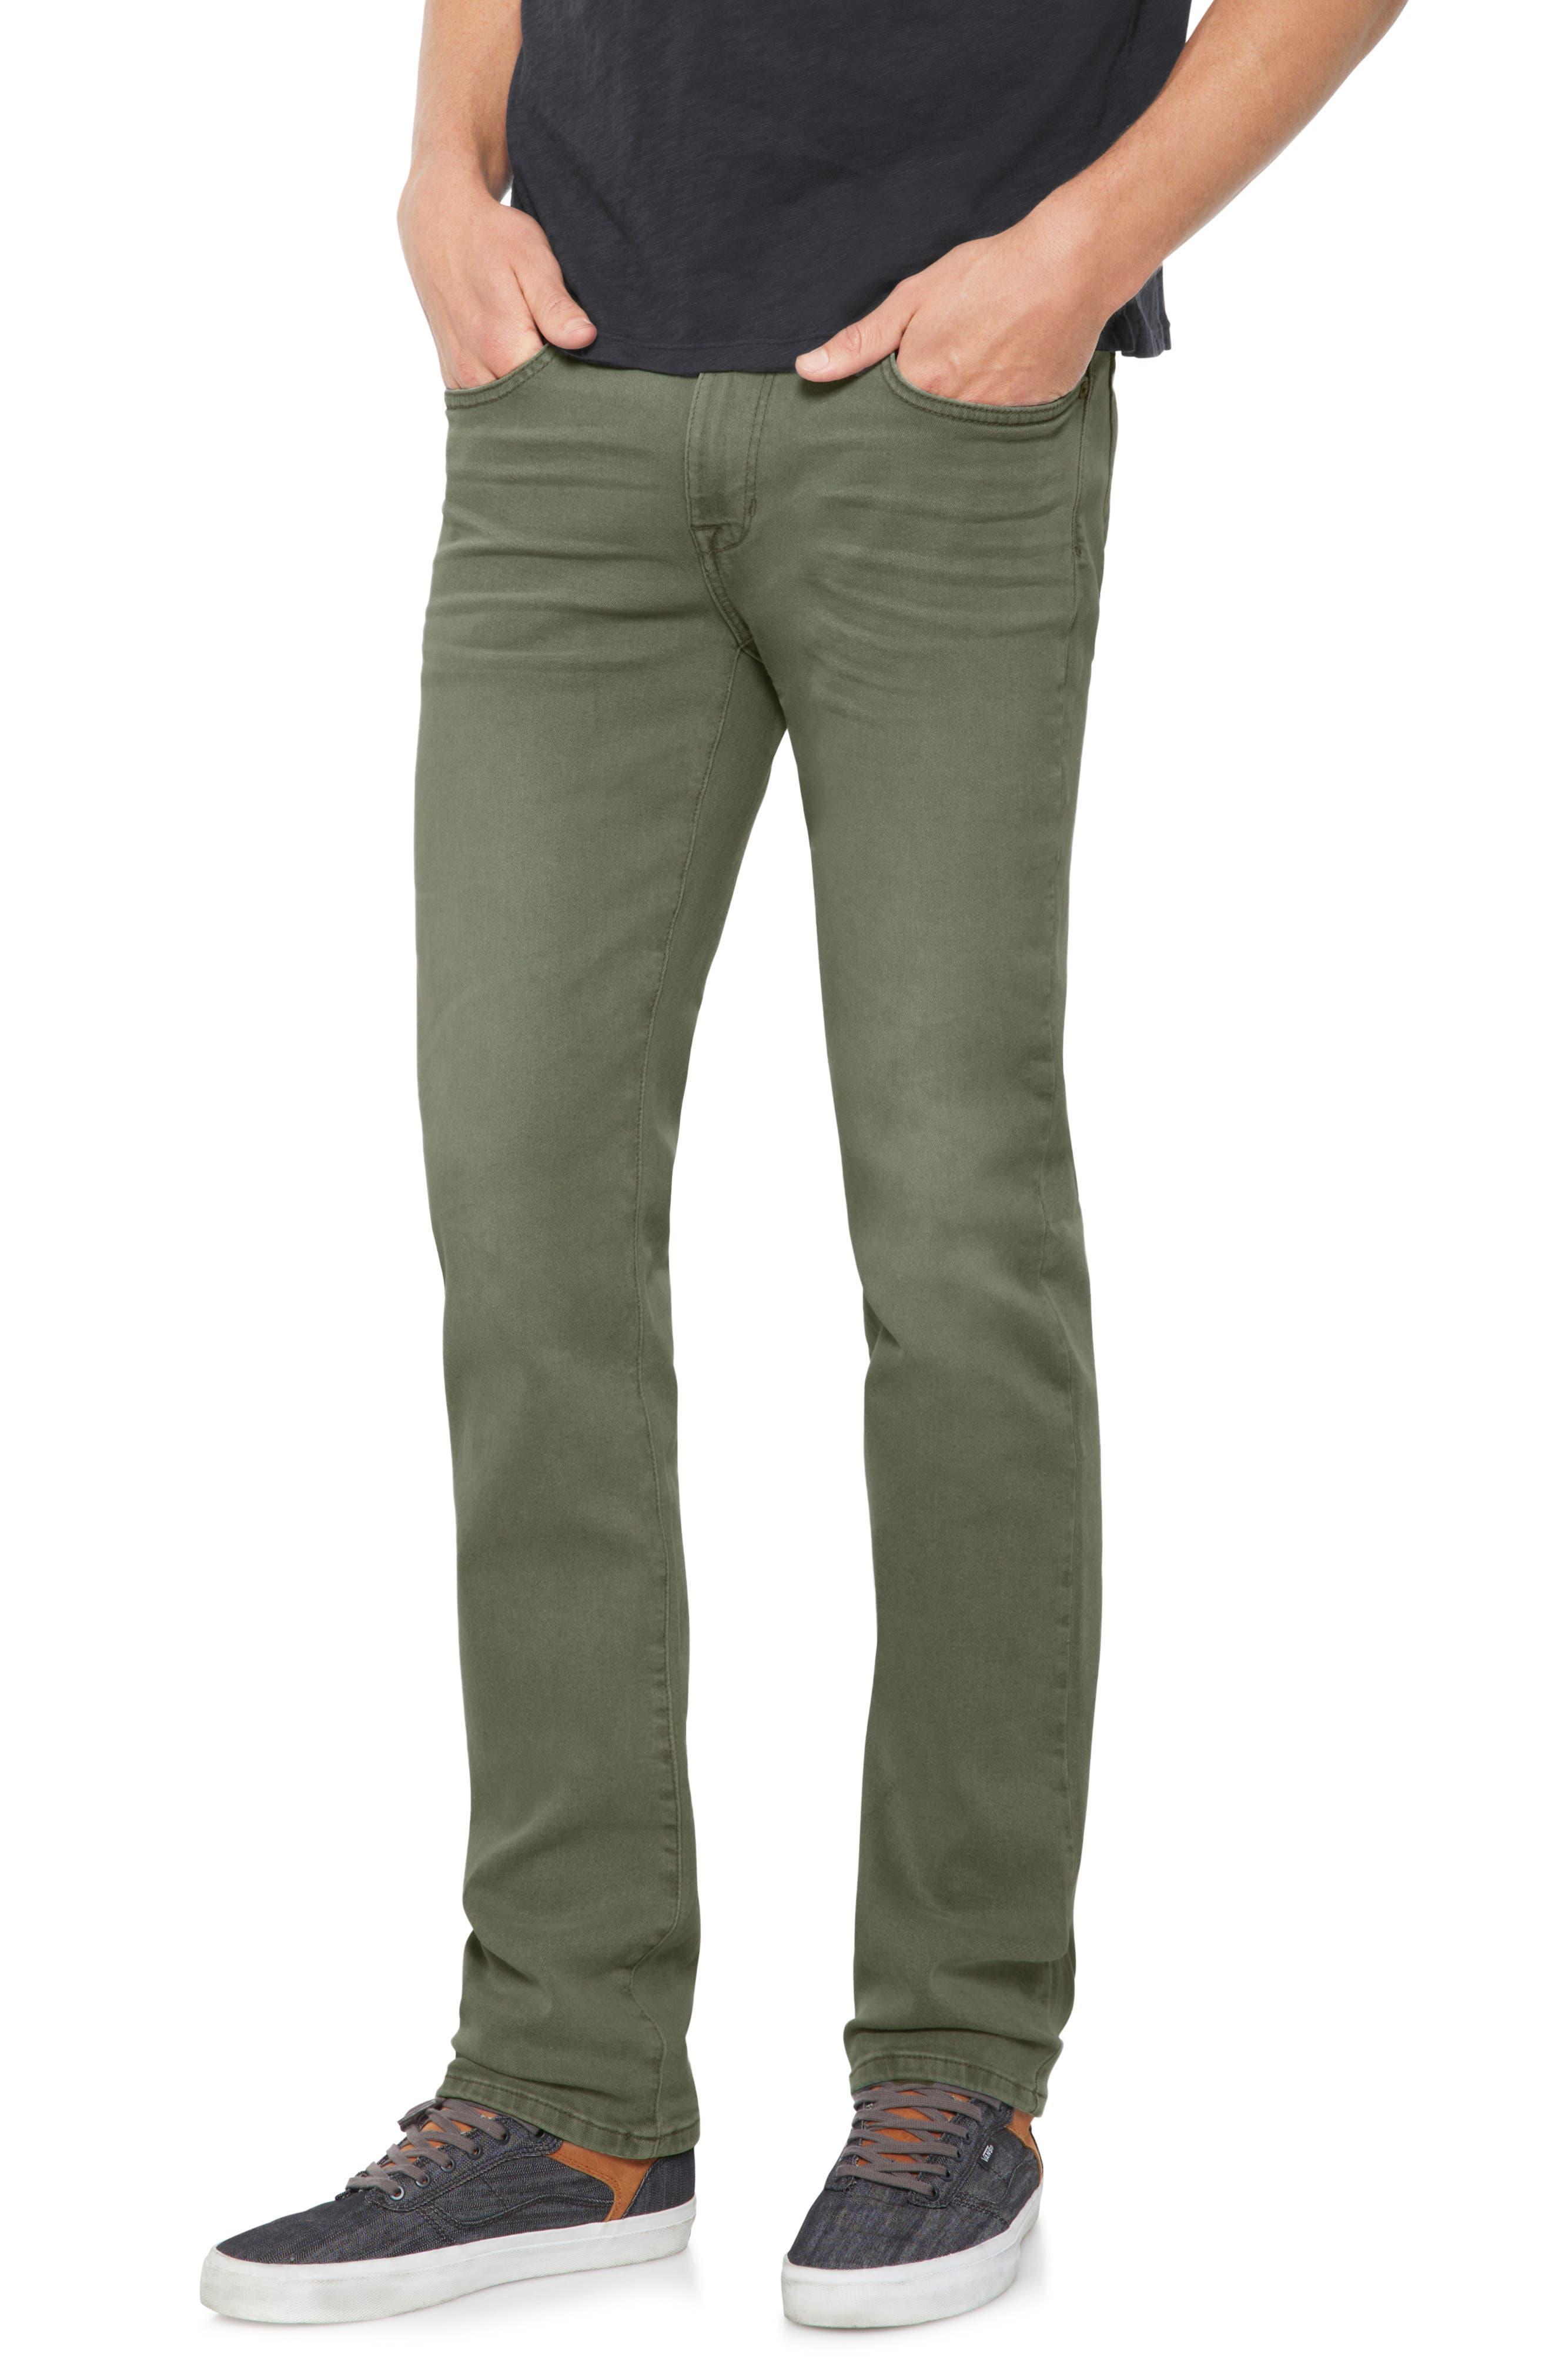 Brixton Slim Straight Leg Jeans,                             Main thumbnail 1, color,                             Olive Tree